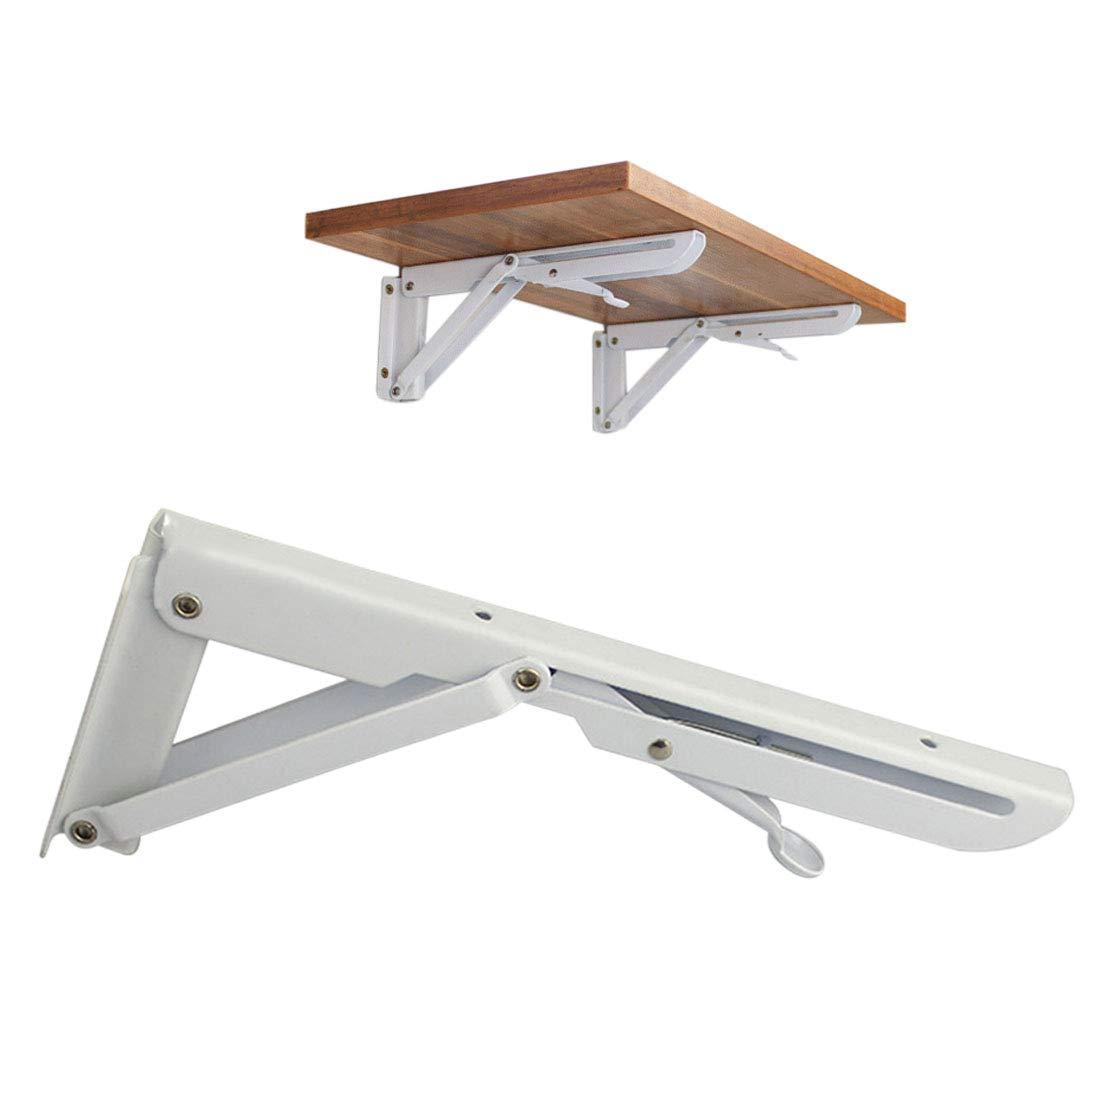 YUENA CARE Stainless Steel Wall-mounted Bracket Folding Triangular Support Shelf Bracket